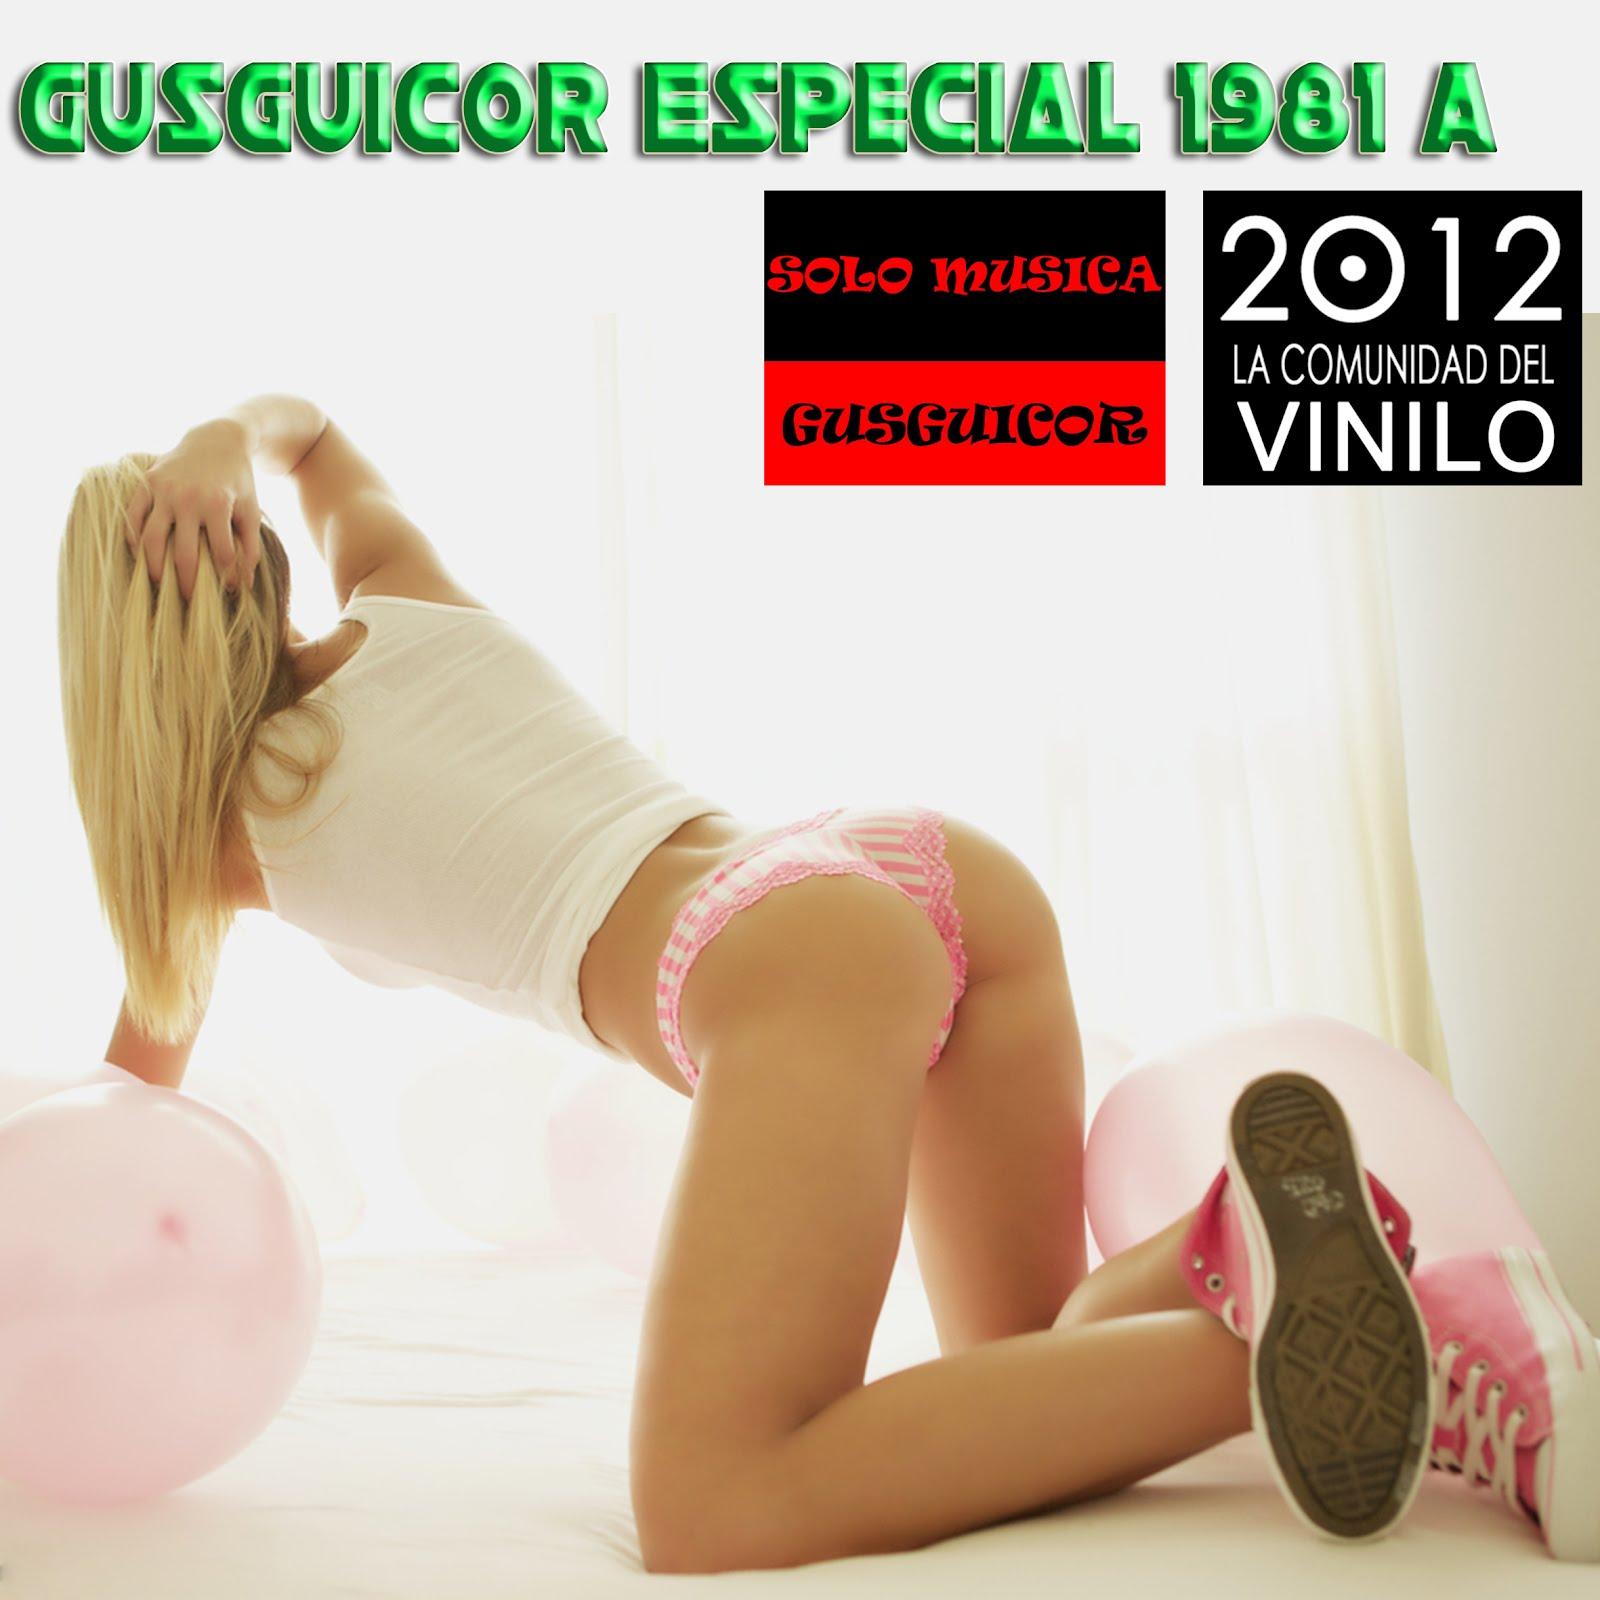 http://4.bp.blogspot.com/-nX0VDRrn8E4/T7y6htvvS_I/AAAAAAAARh4/uABgzsMlSOw/s1600/Gusguicor%2BEspecial%2B1981%2BA%2Bweb.jpg